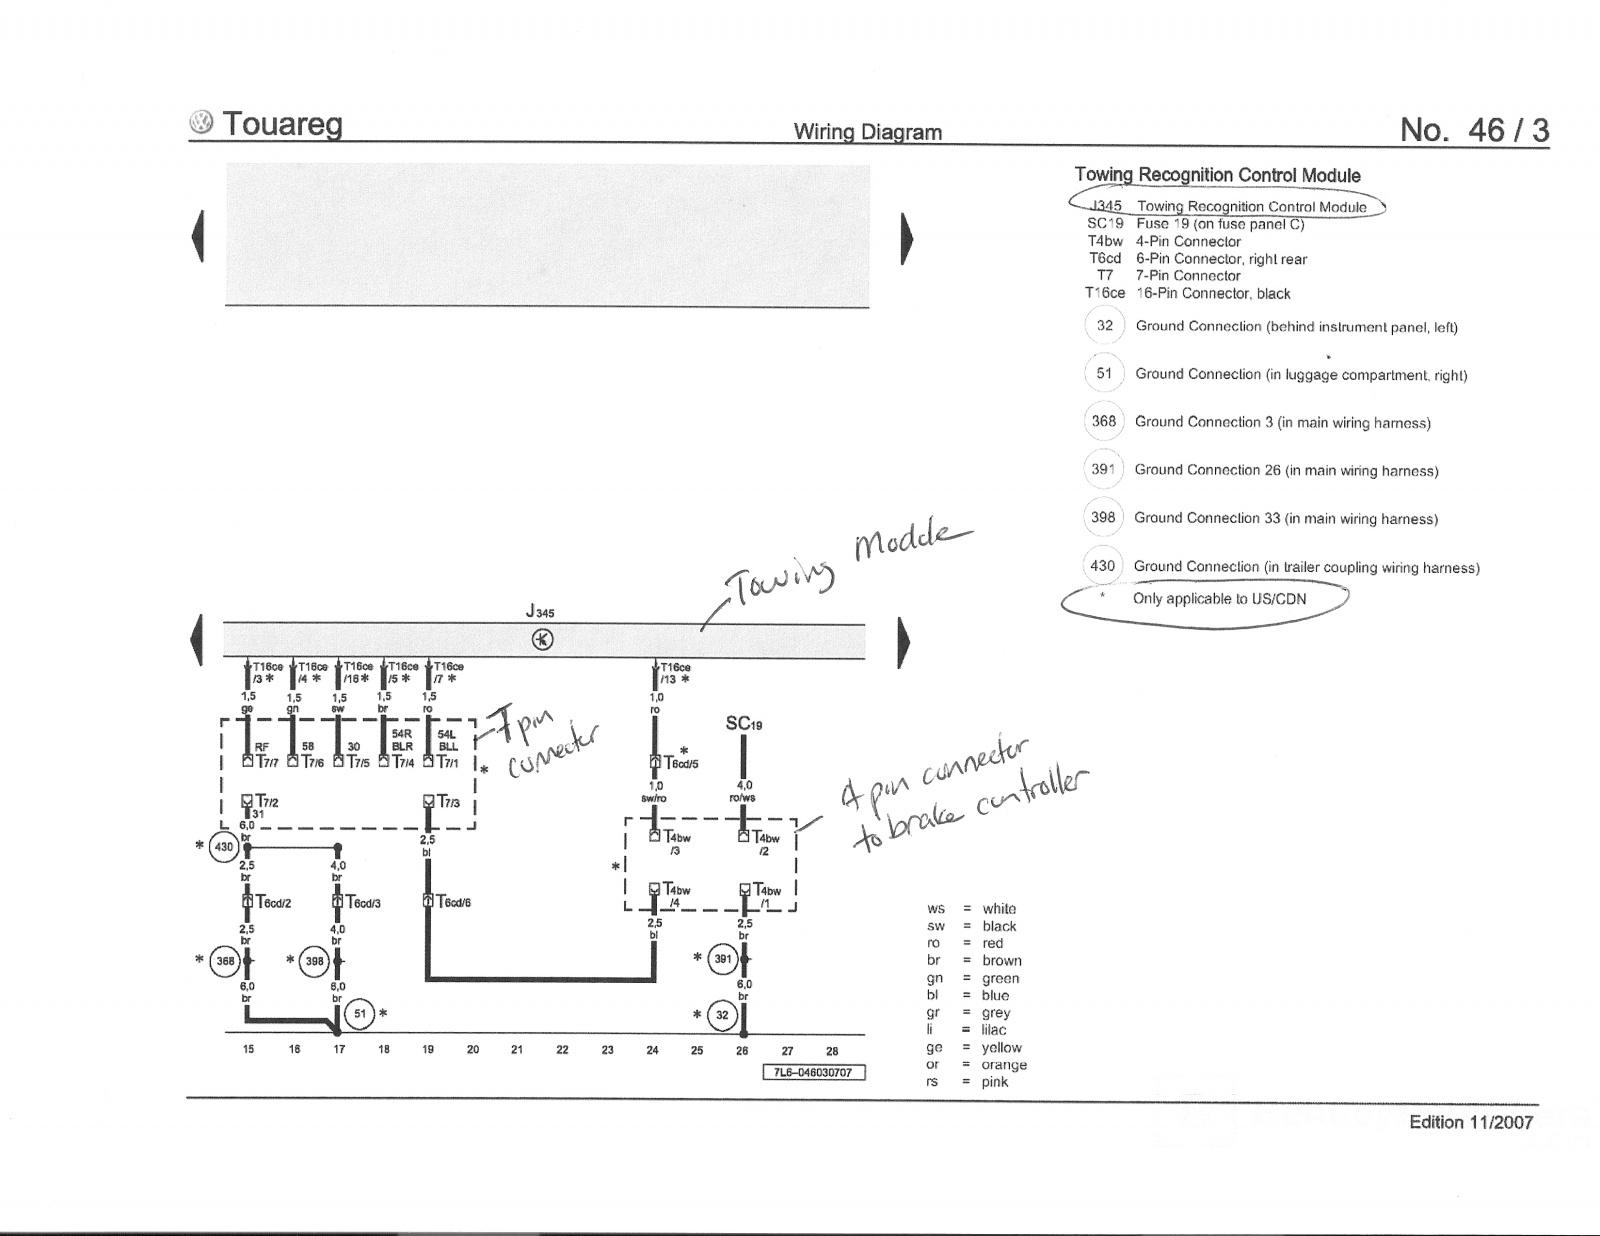 Wiring Diagram For Tow Bar Electrics Modern Design Of Towbar 7 Pin Touareg Gallery Trailer Brake Force